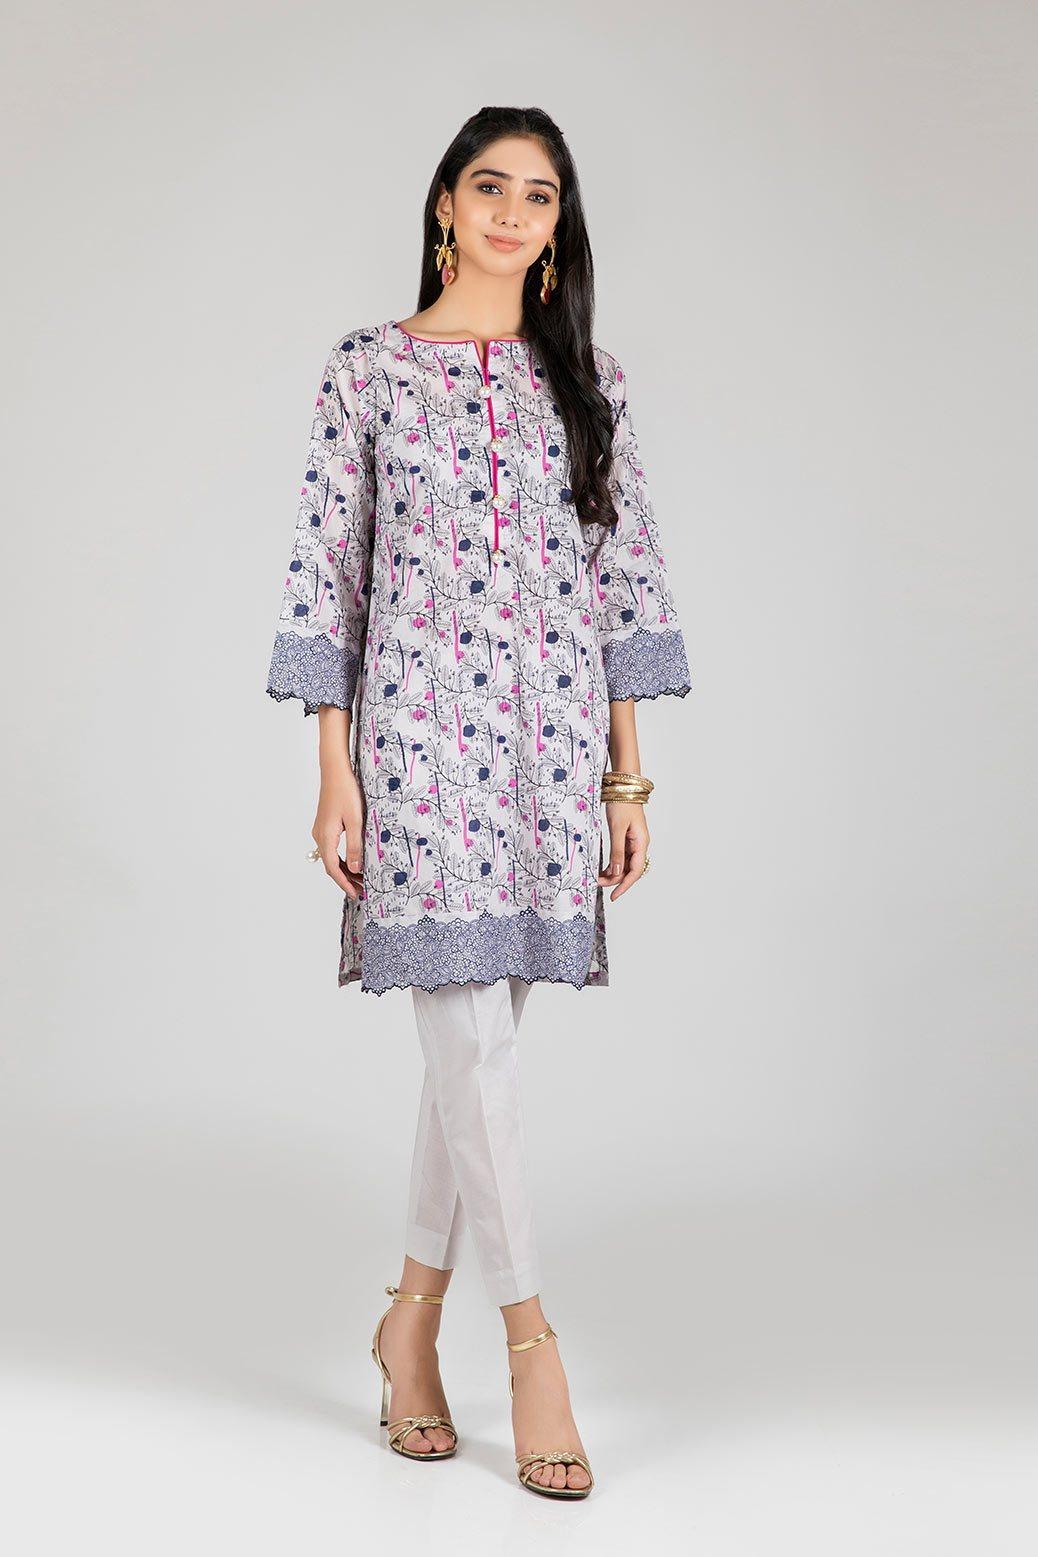 Bonanza Satrangi Two Piece Dress Beige color